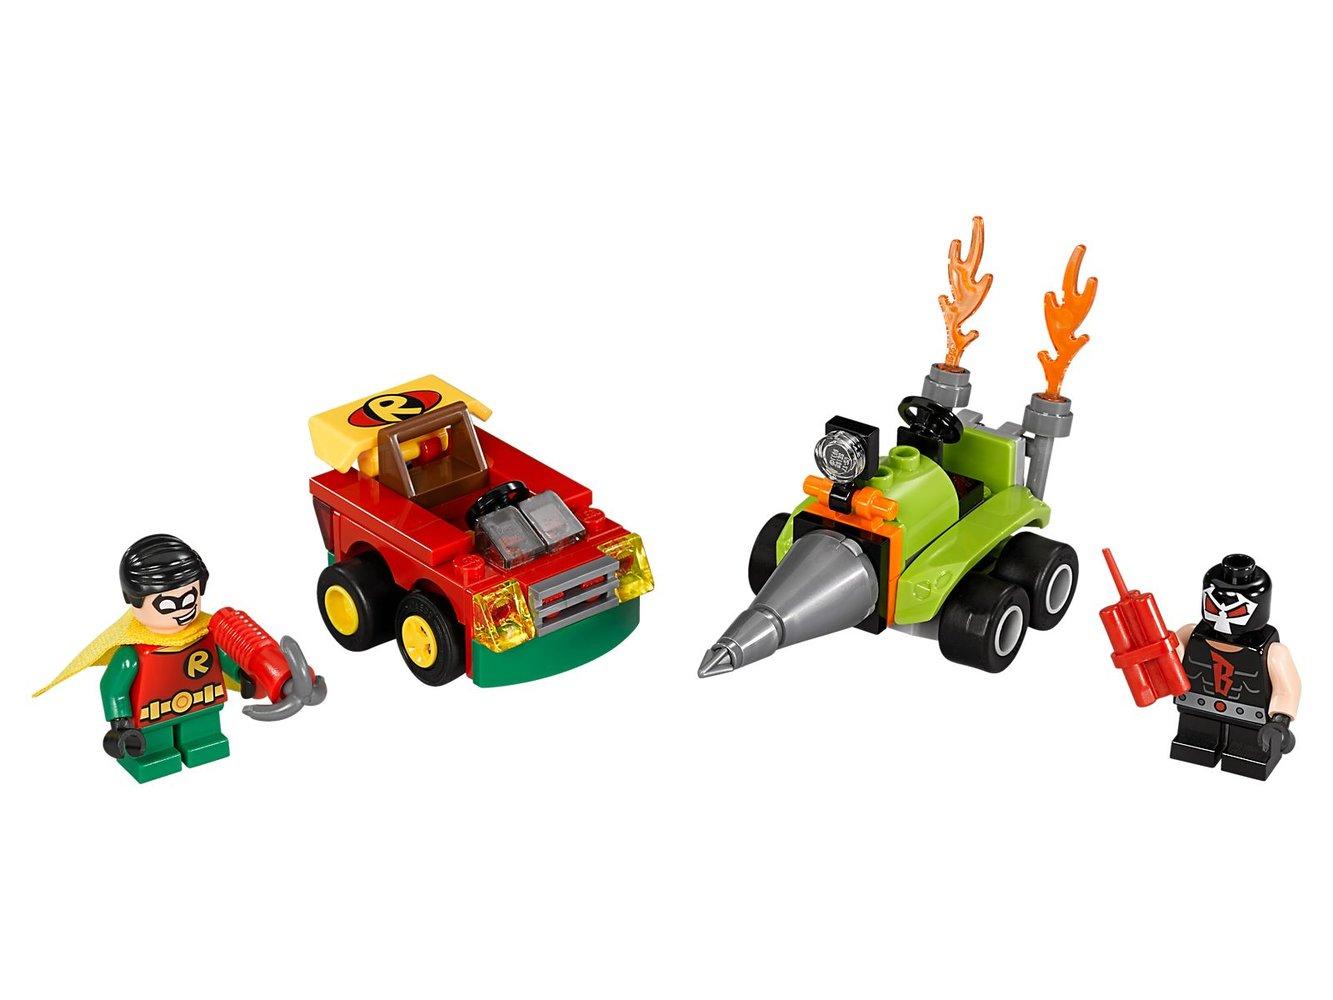 Mighty Micros: Robin vs. Bane